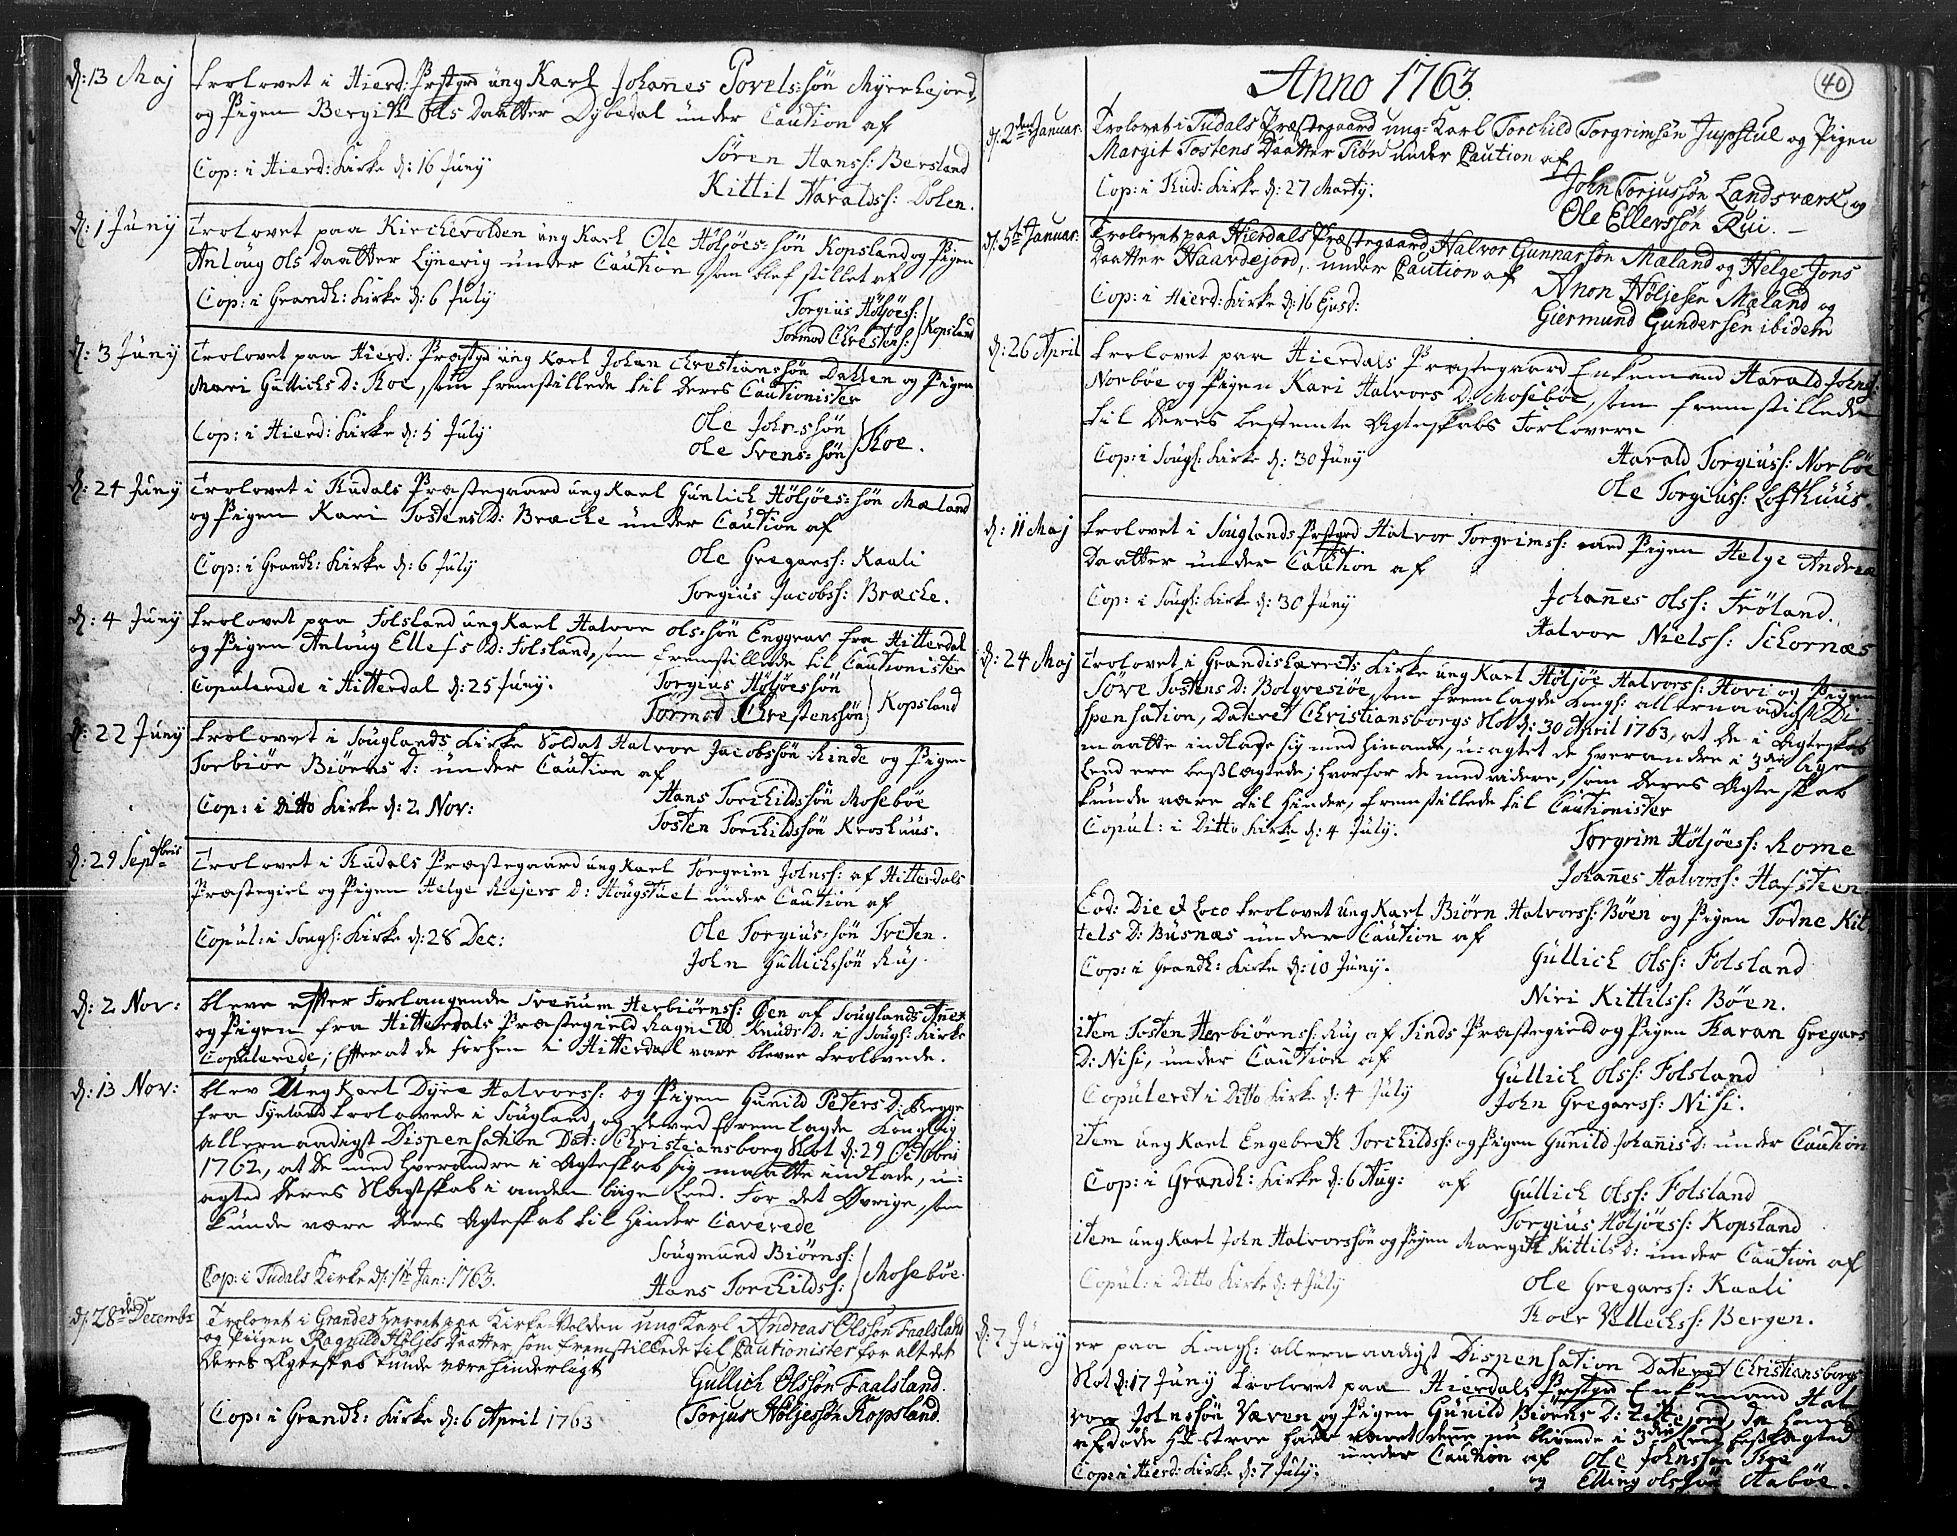 SAKO, Hjartdal kirkebøker, F/Fa/L0004: Ministerialbok nr. I 4, 1727-1795, s. 40